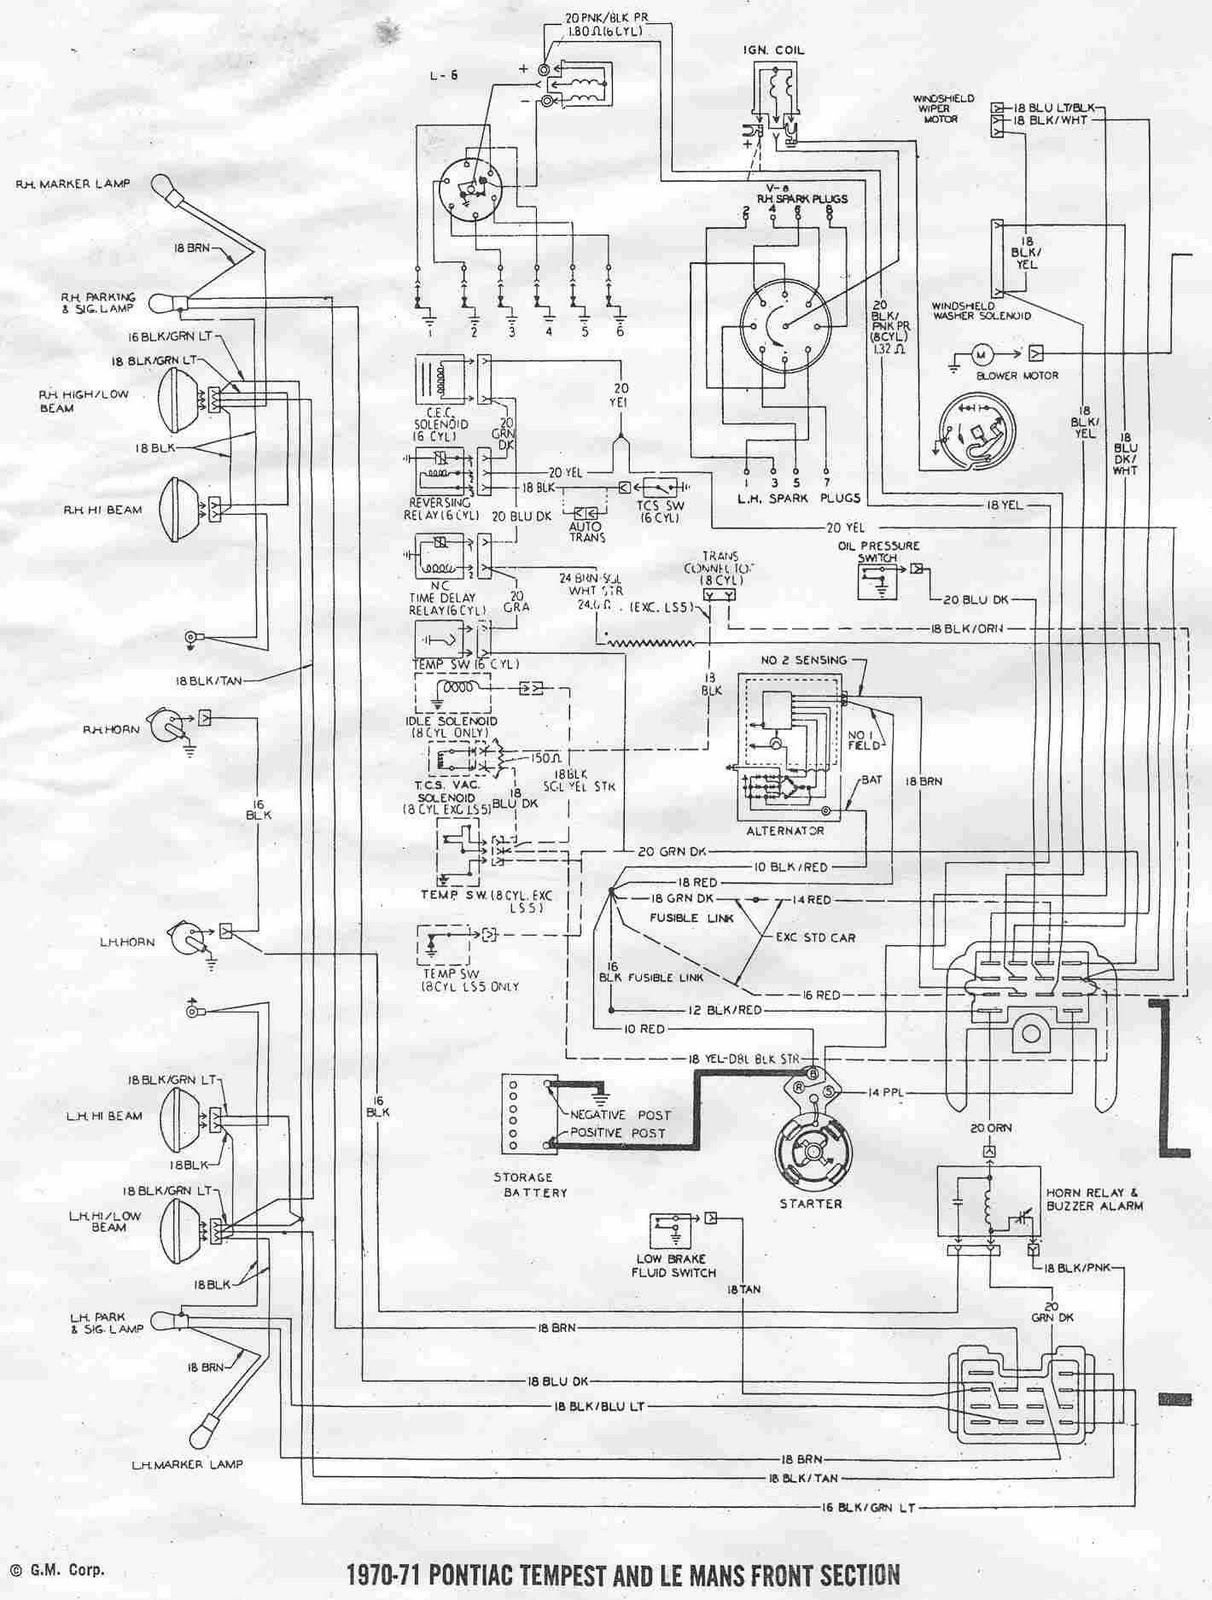 small resolution of 1967 pontiac lemans wiring diagram wiring diagrams rh 34 jennifer retzke de 1964 pontiac gto wiring